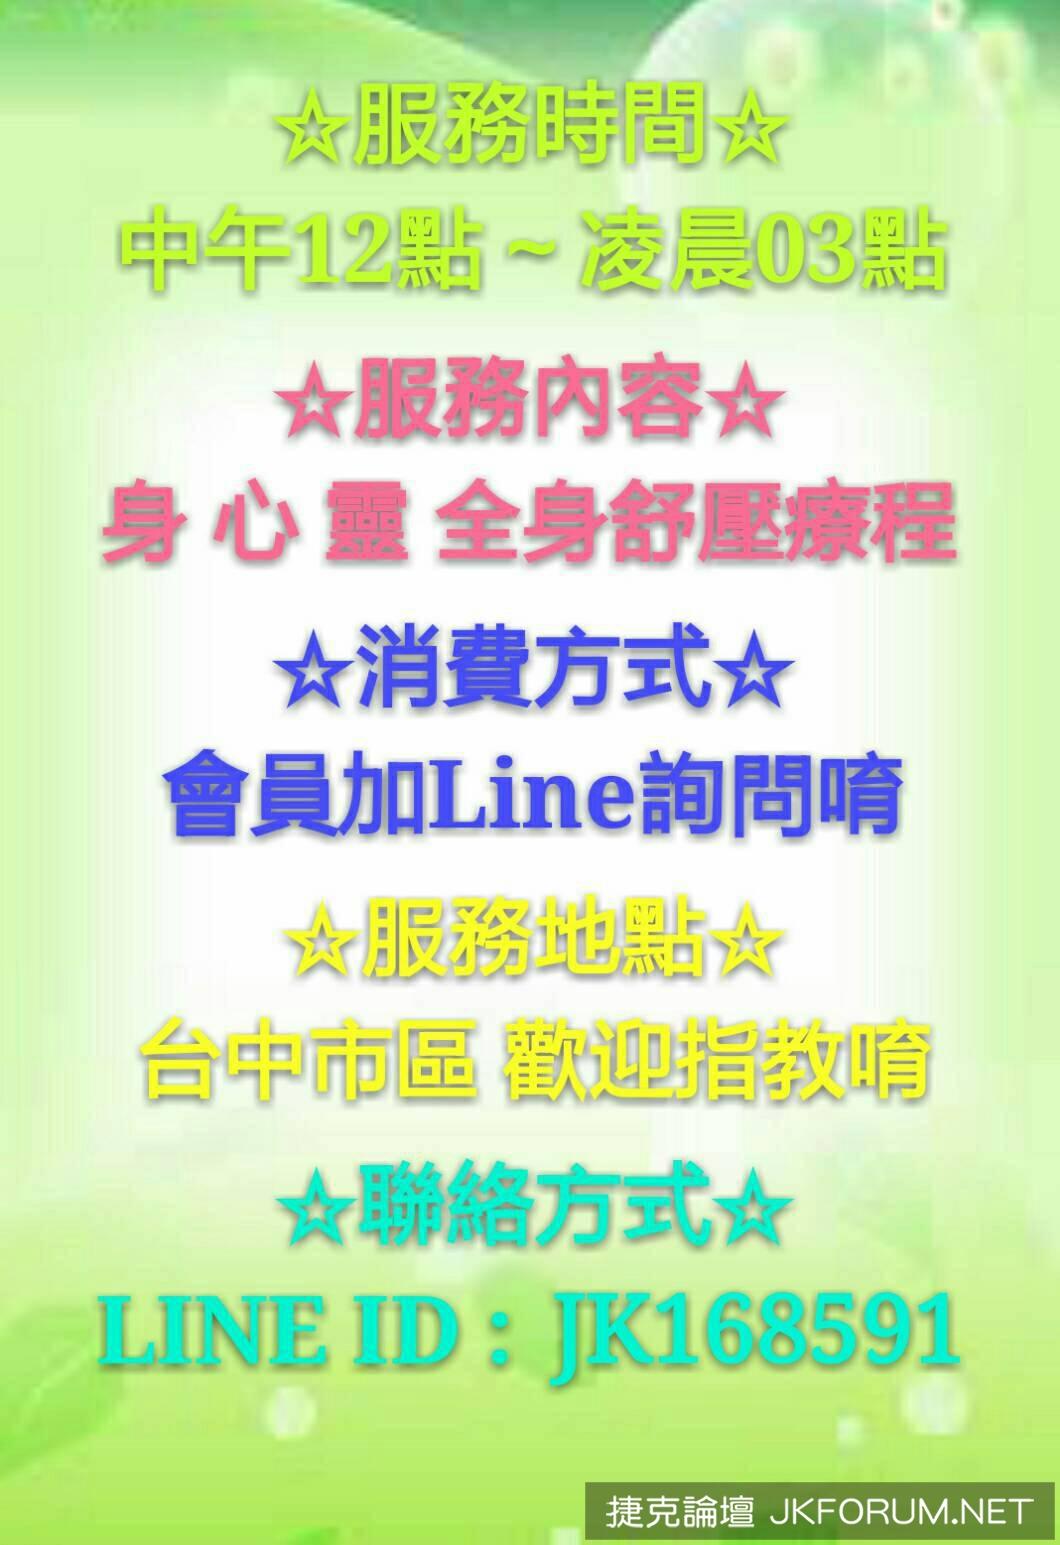 LINE  ID : JK168591